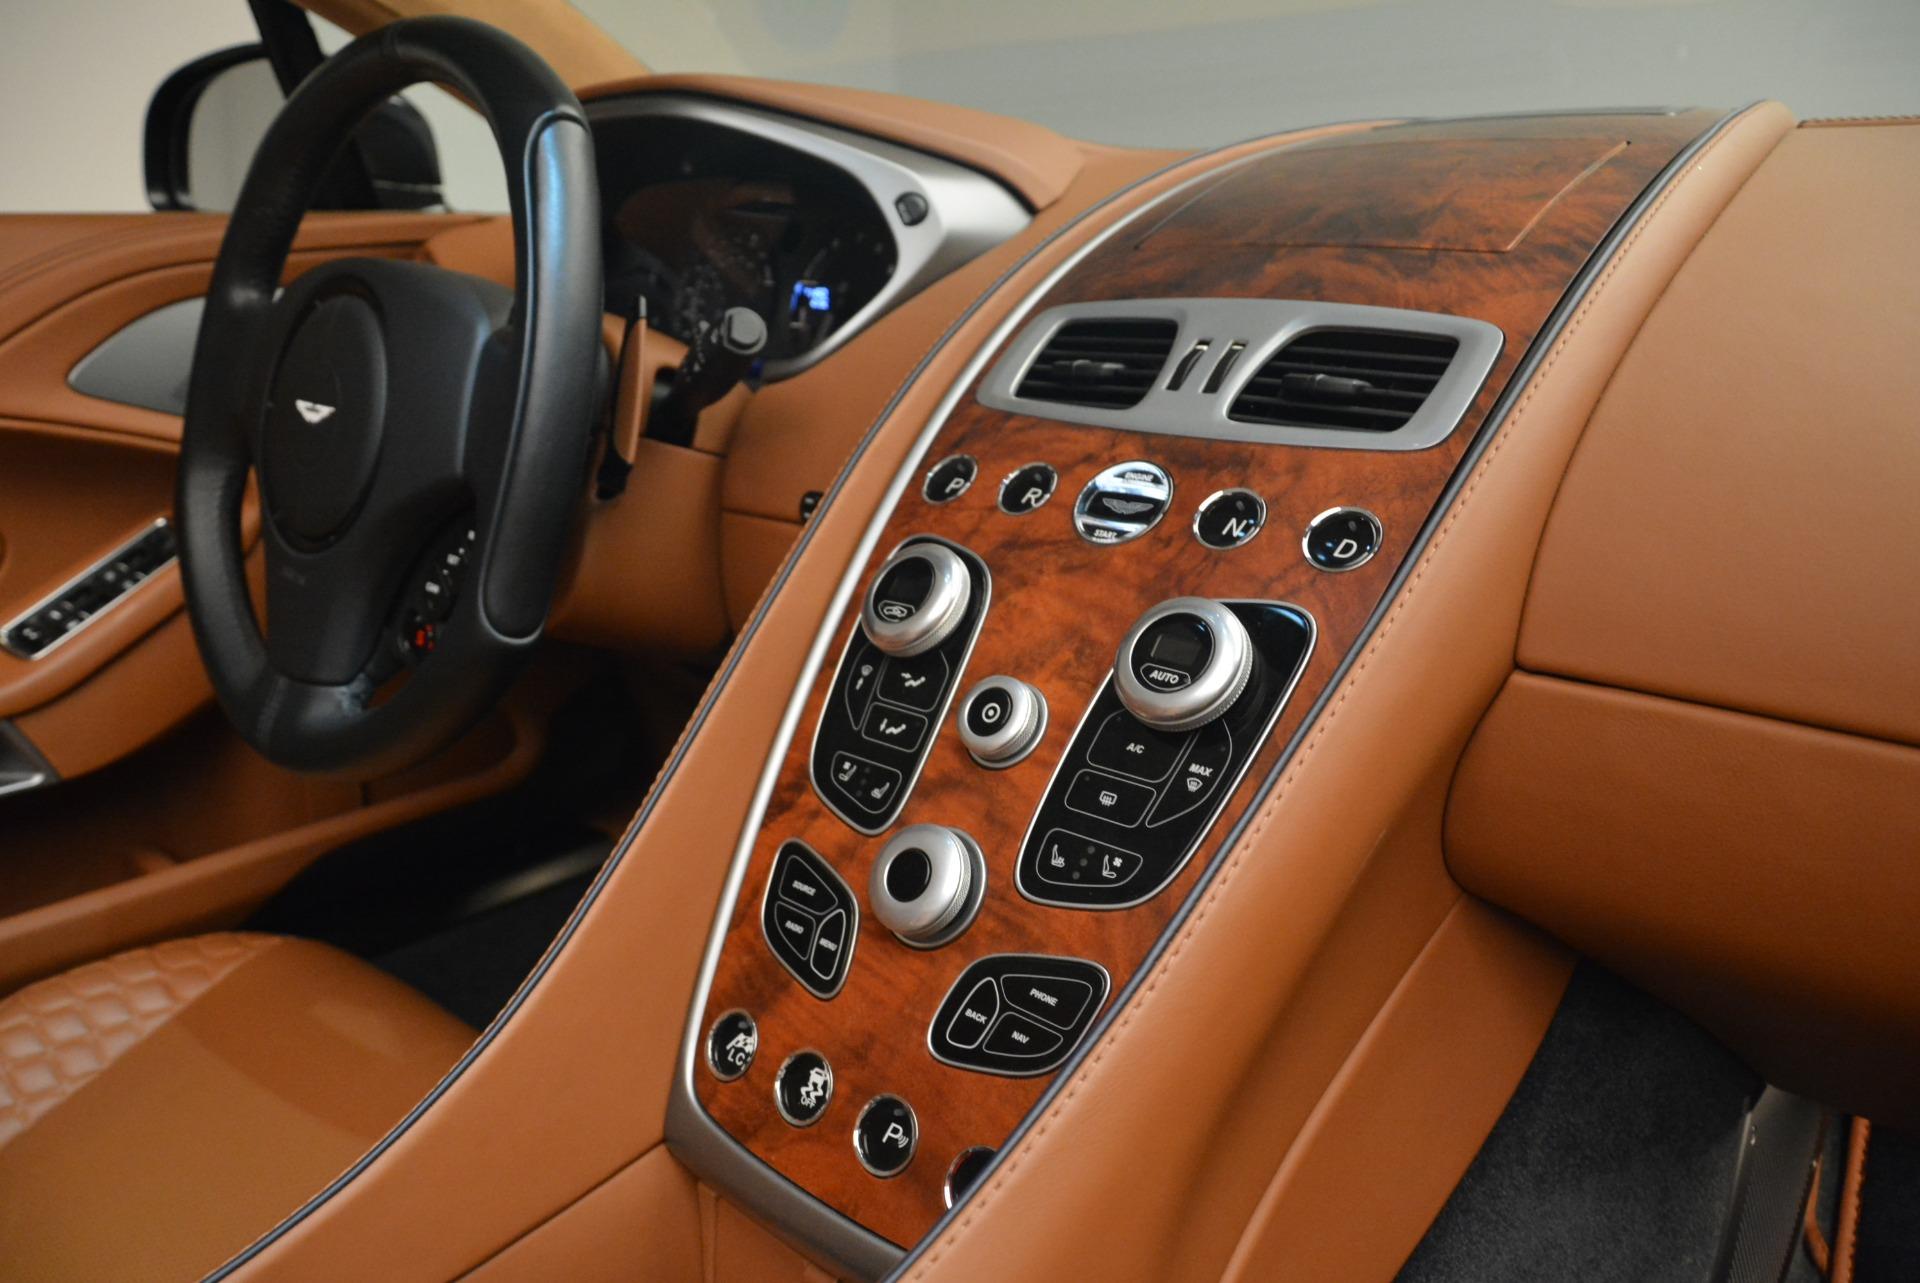 Used 2014 Aston Martin Vanquish Volante For Sale In Greenwich, CT 2097_p26